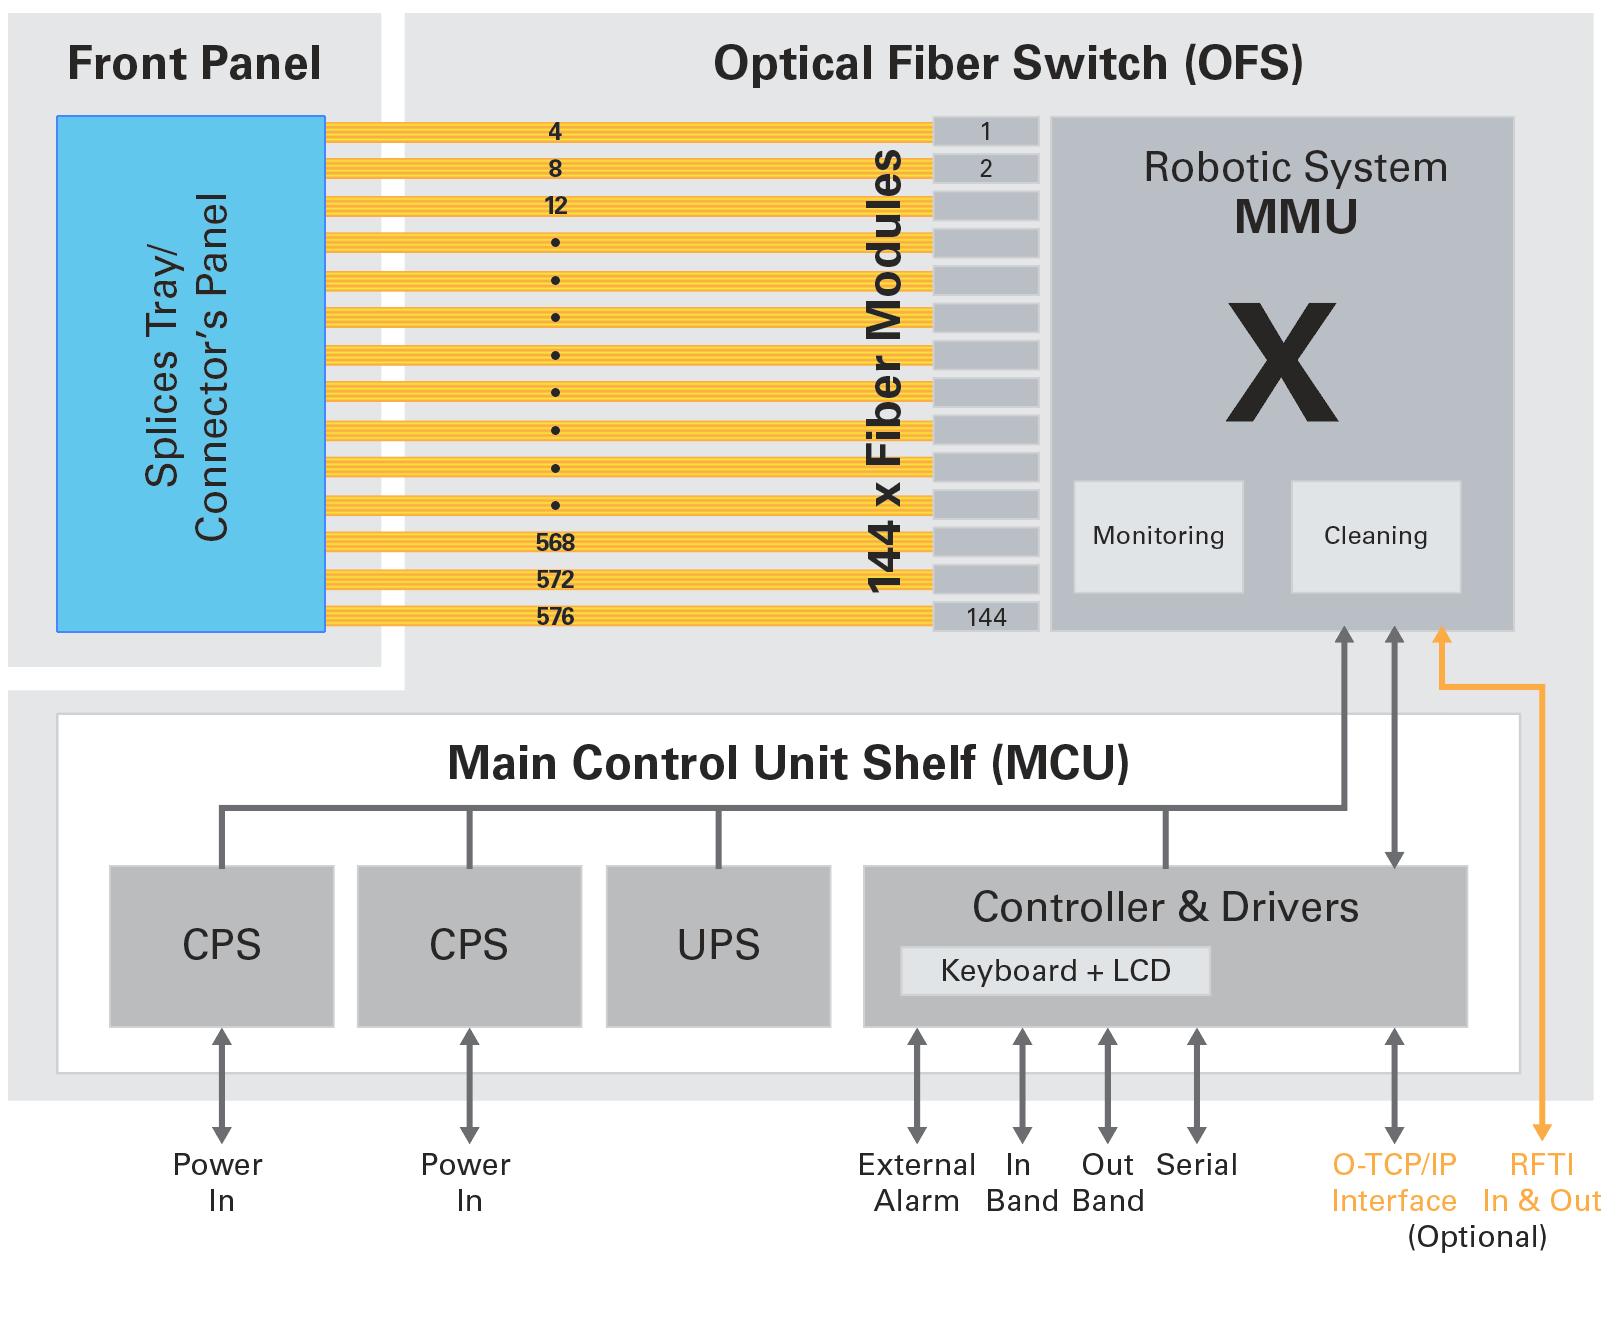 XENOptics XSOS 576D product architecture